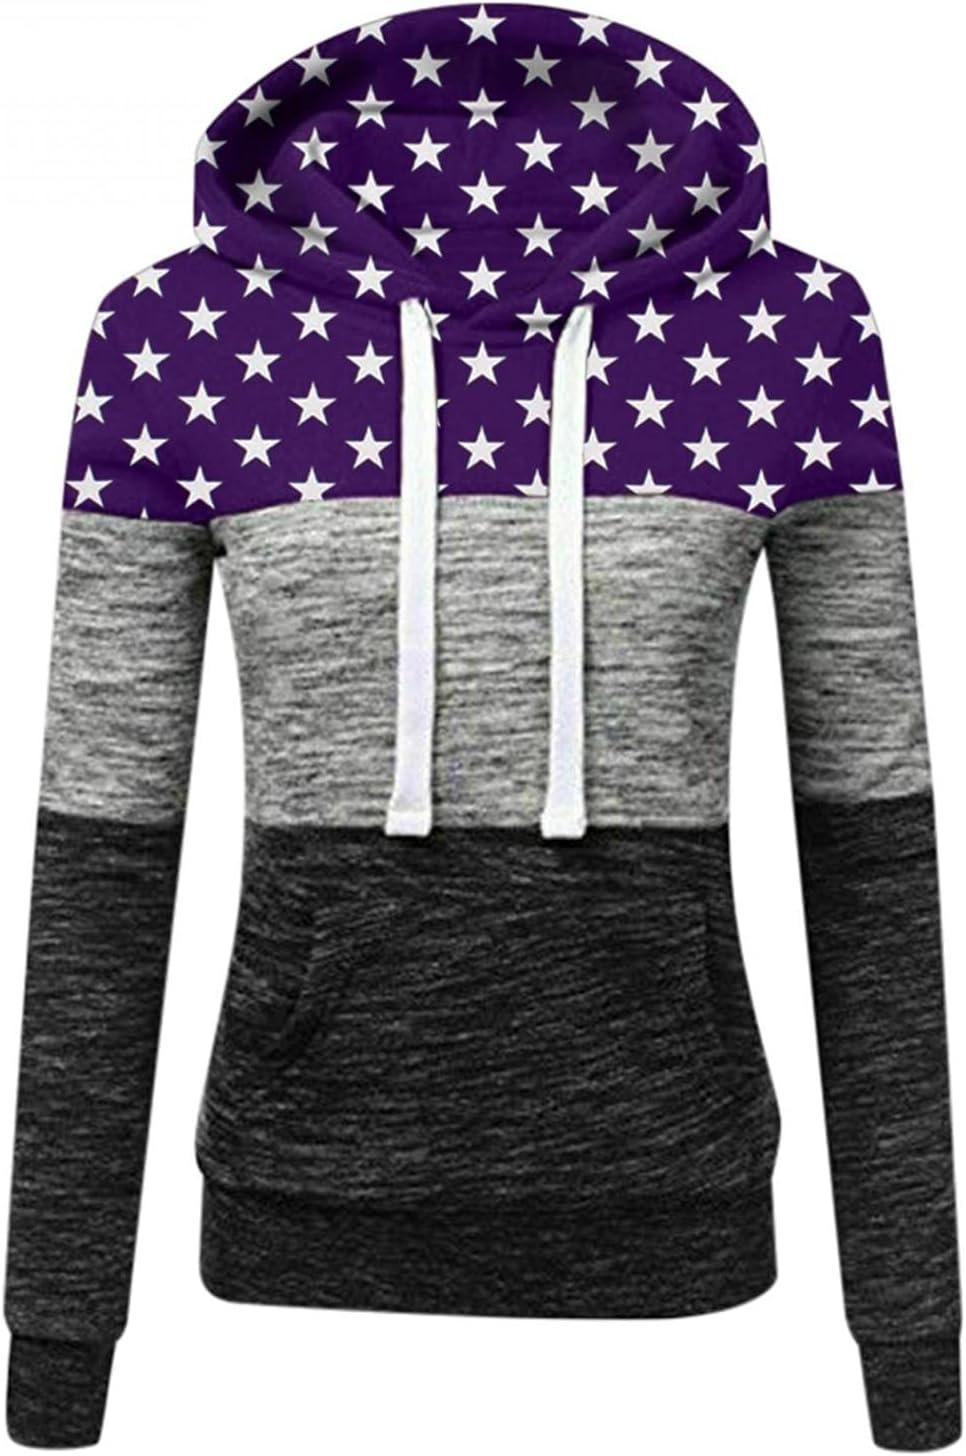 Nulairt Womens Active Long Sleeve Fleece Zip Up Hoodie with Plus Size Purple